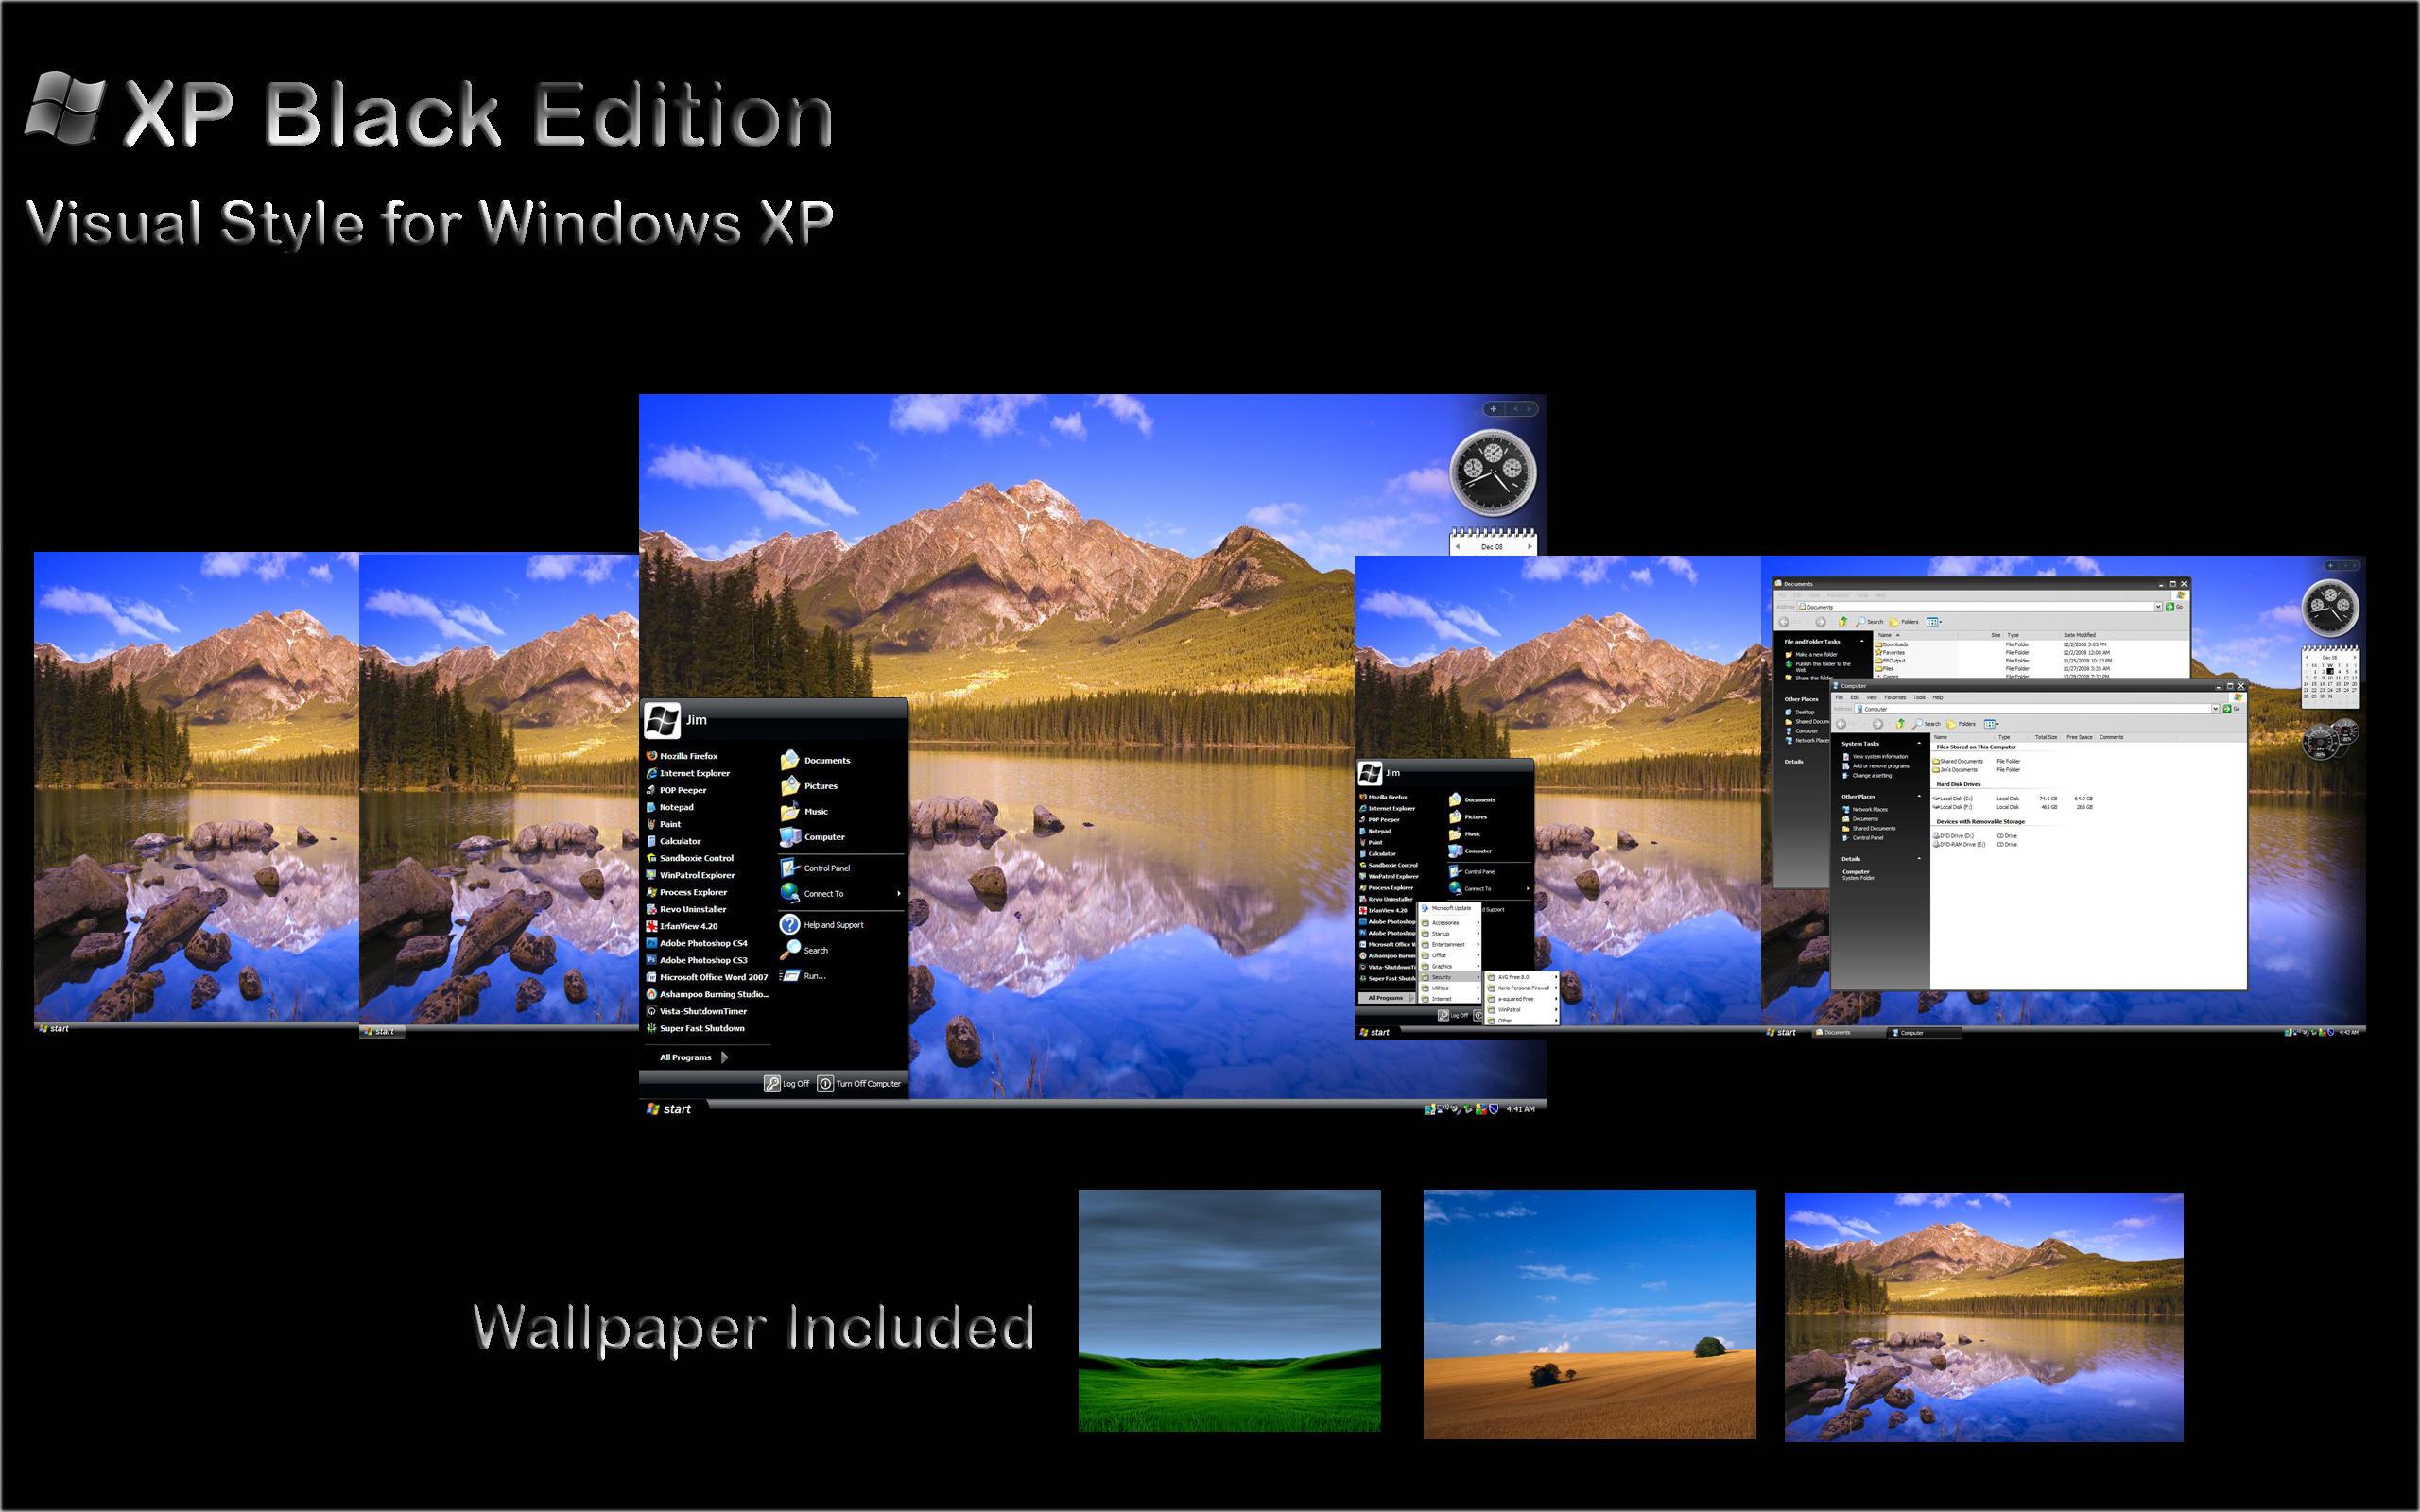 Windows xp black edition theme for xp.